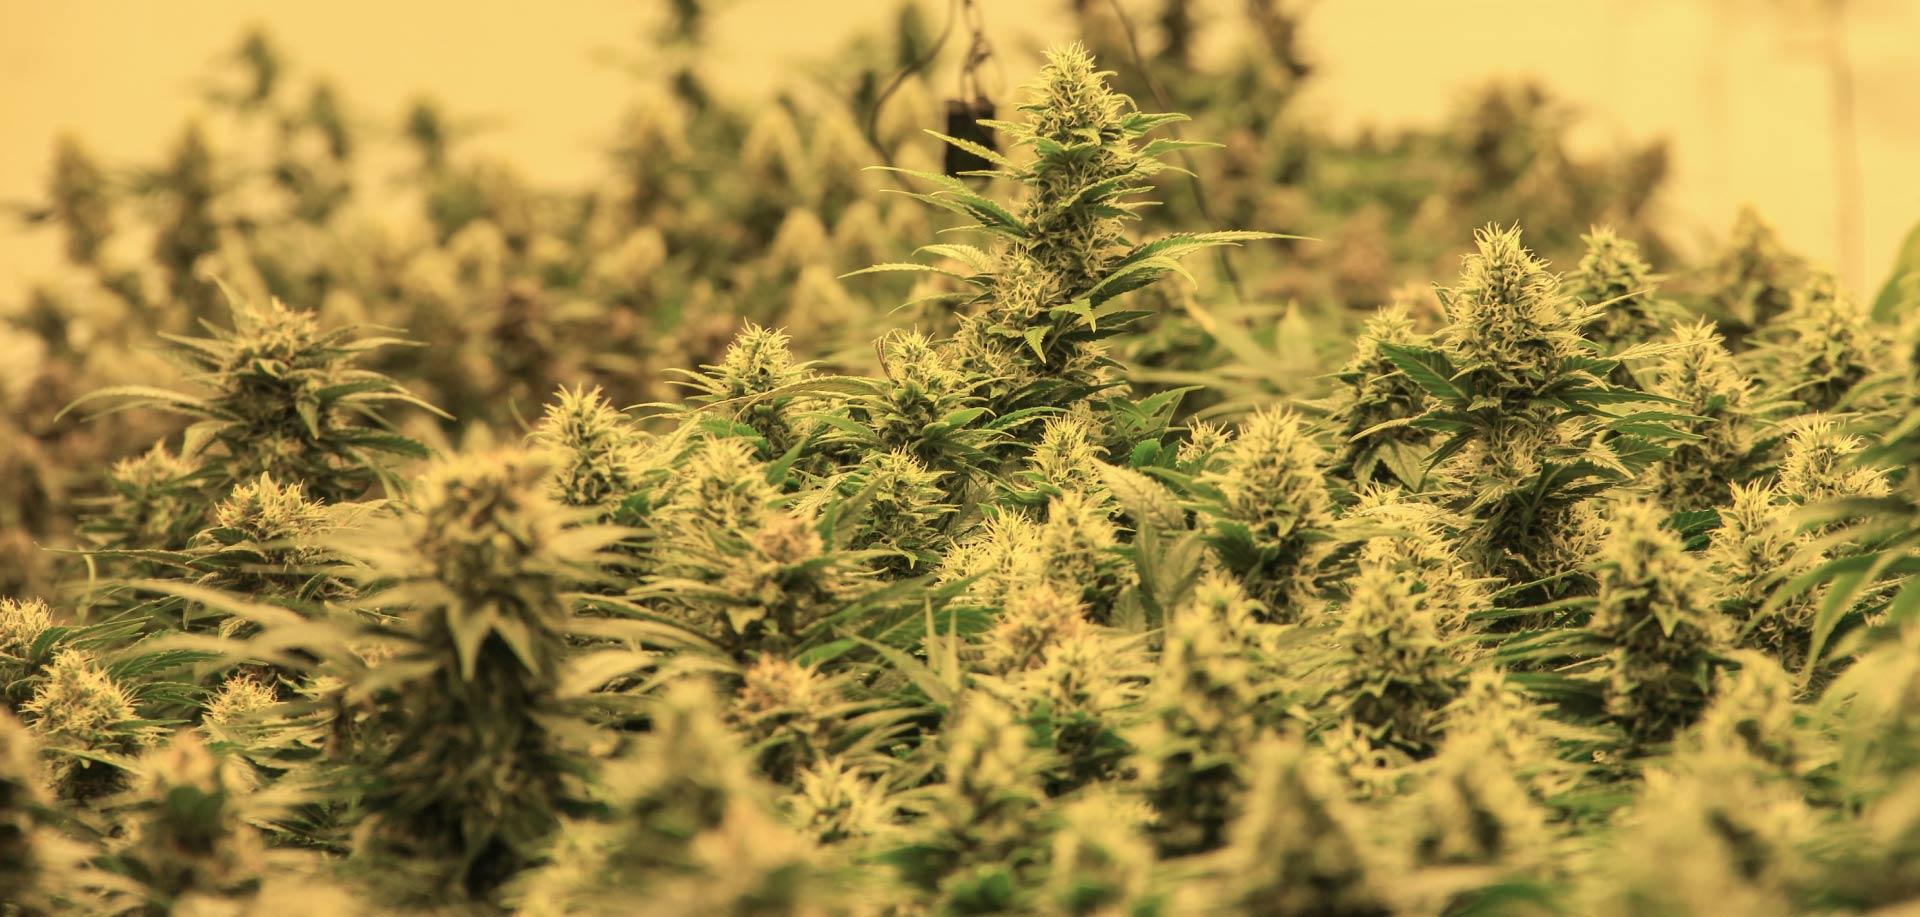 ANC-Dispensary-Background-Cannabis